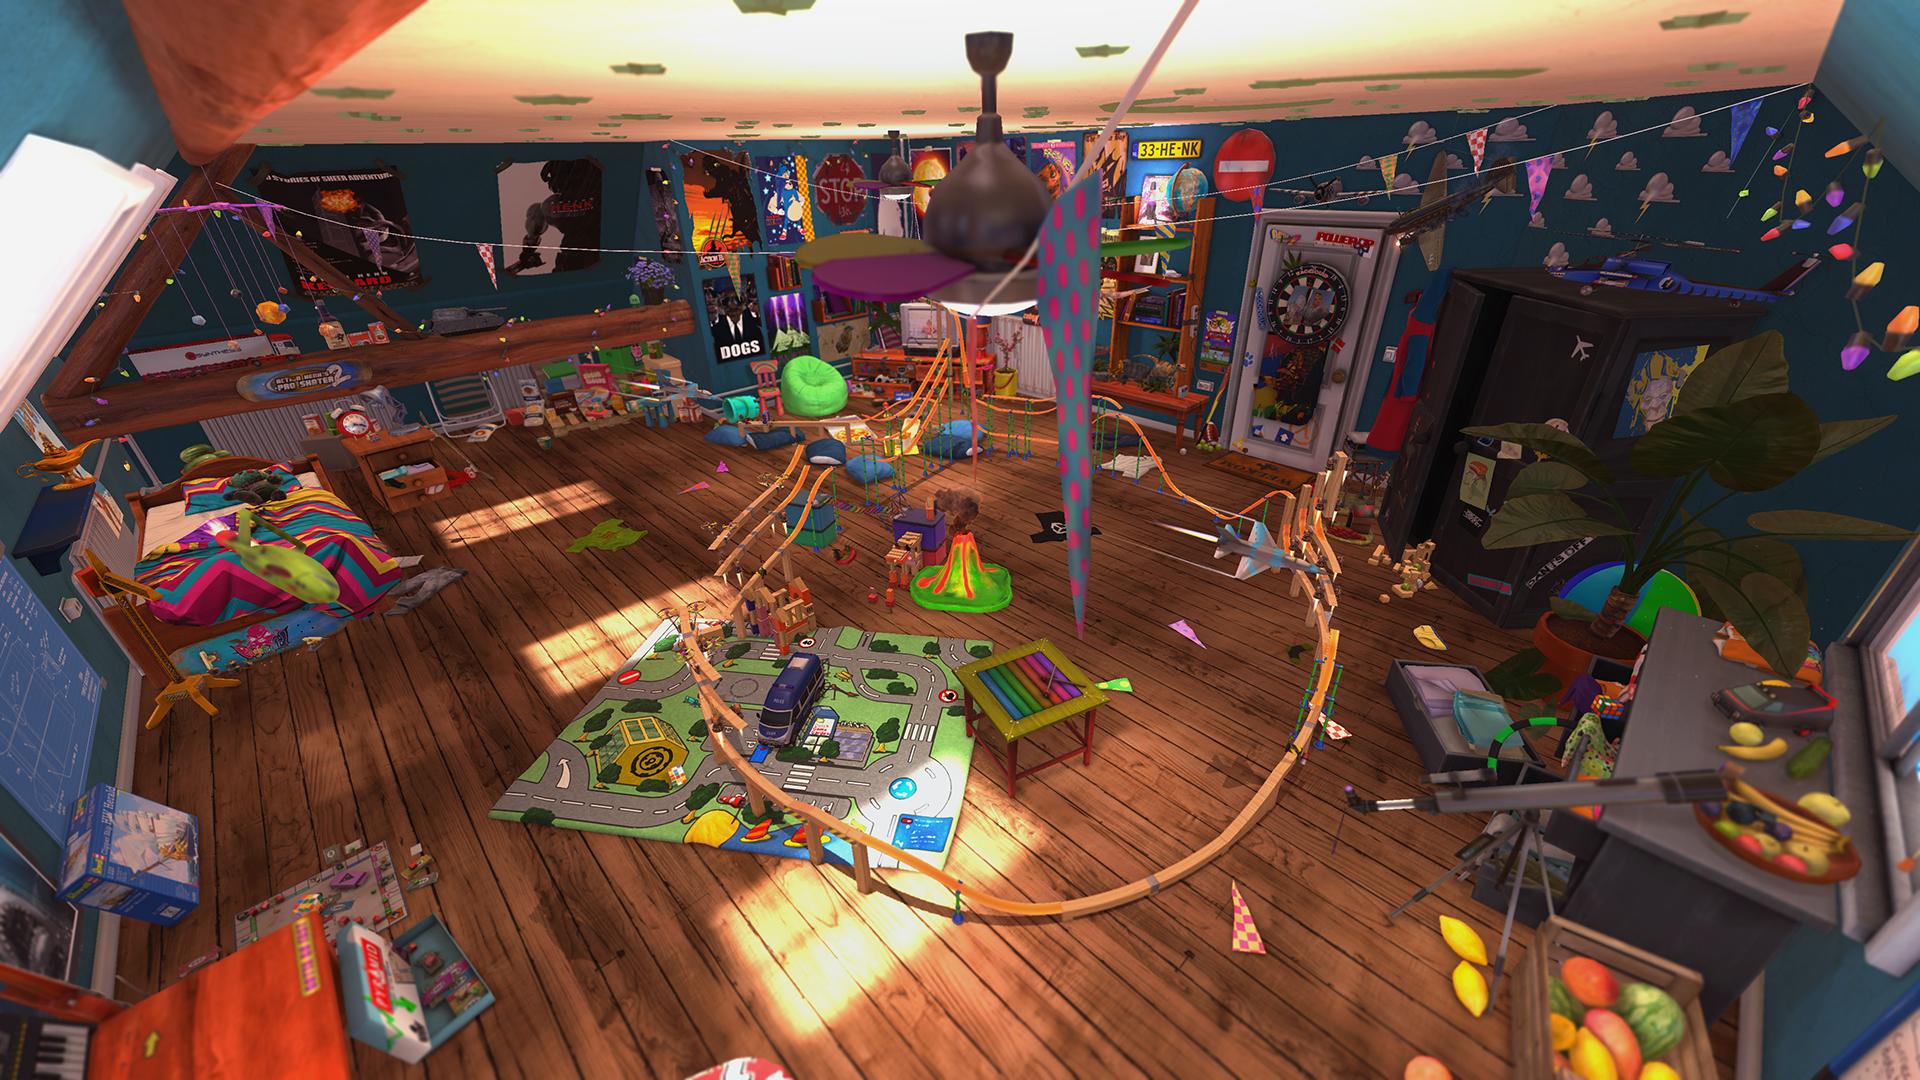 kidsroom_overview_01_HD.jpg